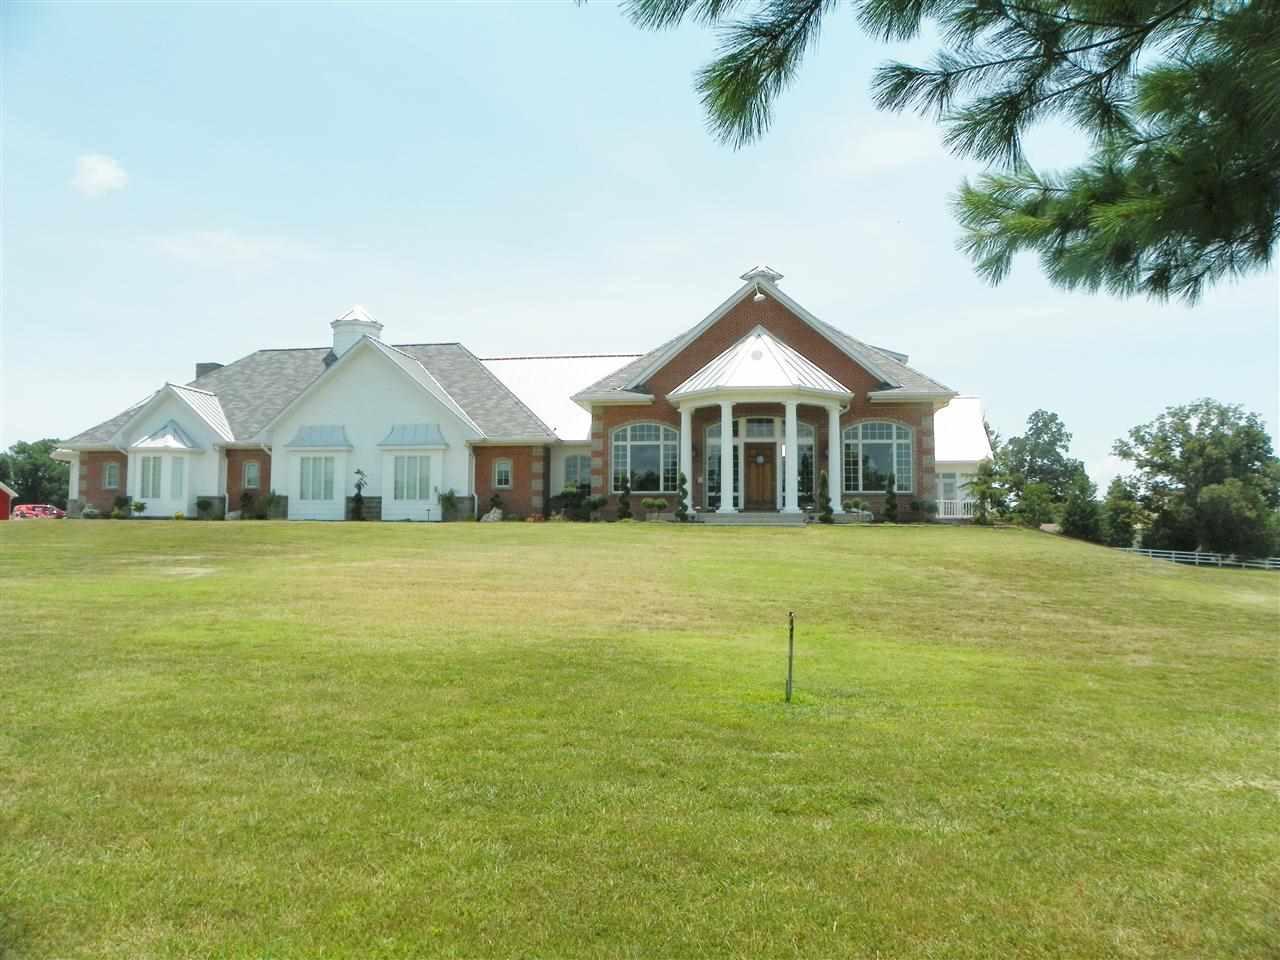 Real Estate for Sale, ListingId: 31761000, Poplar Bluff,MO63901